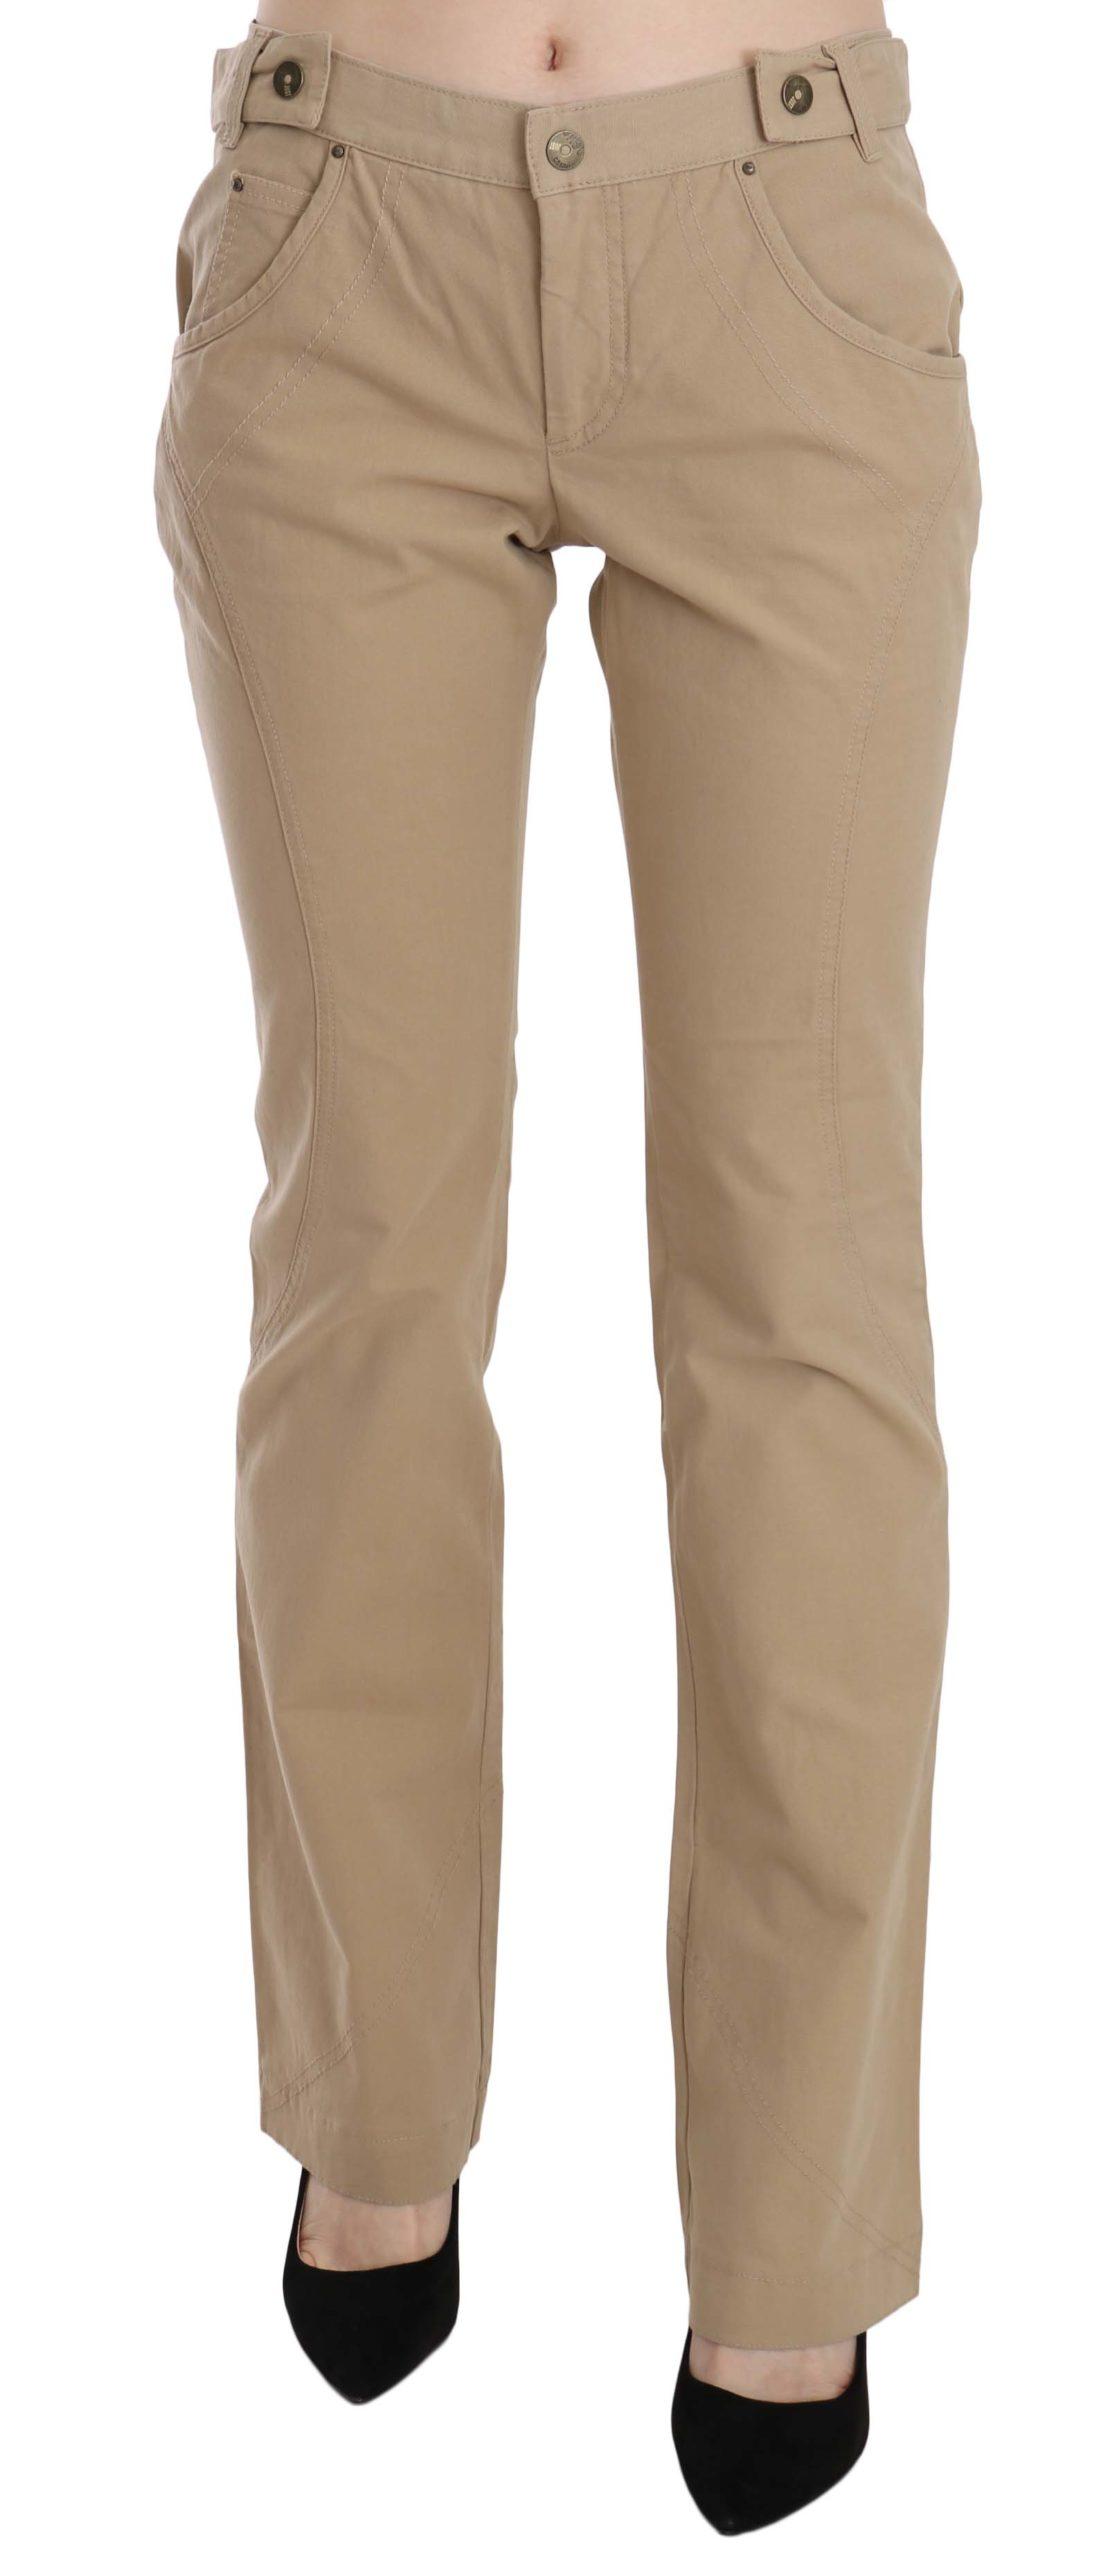 Just Cavalli Women's Mid Waist Straight Trouser Beige PAN70365 - IT44|L